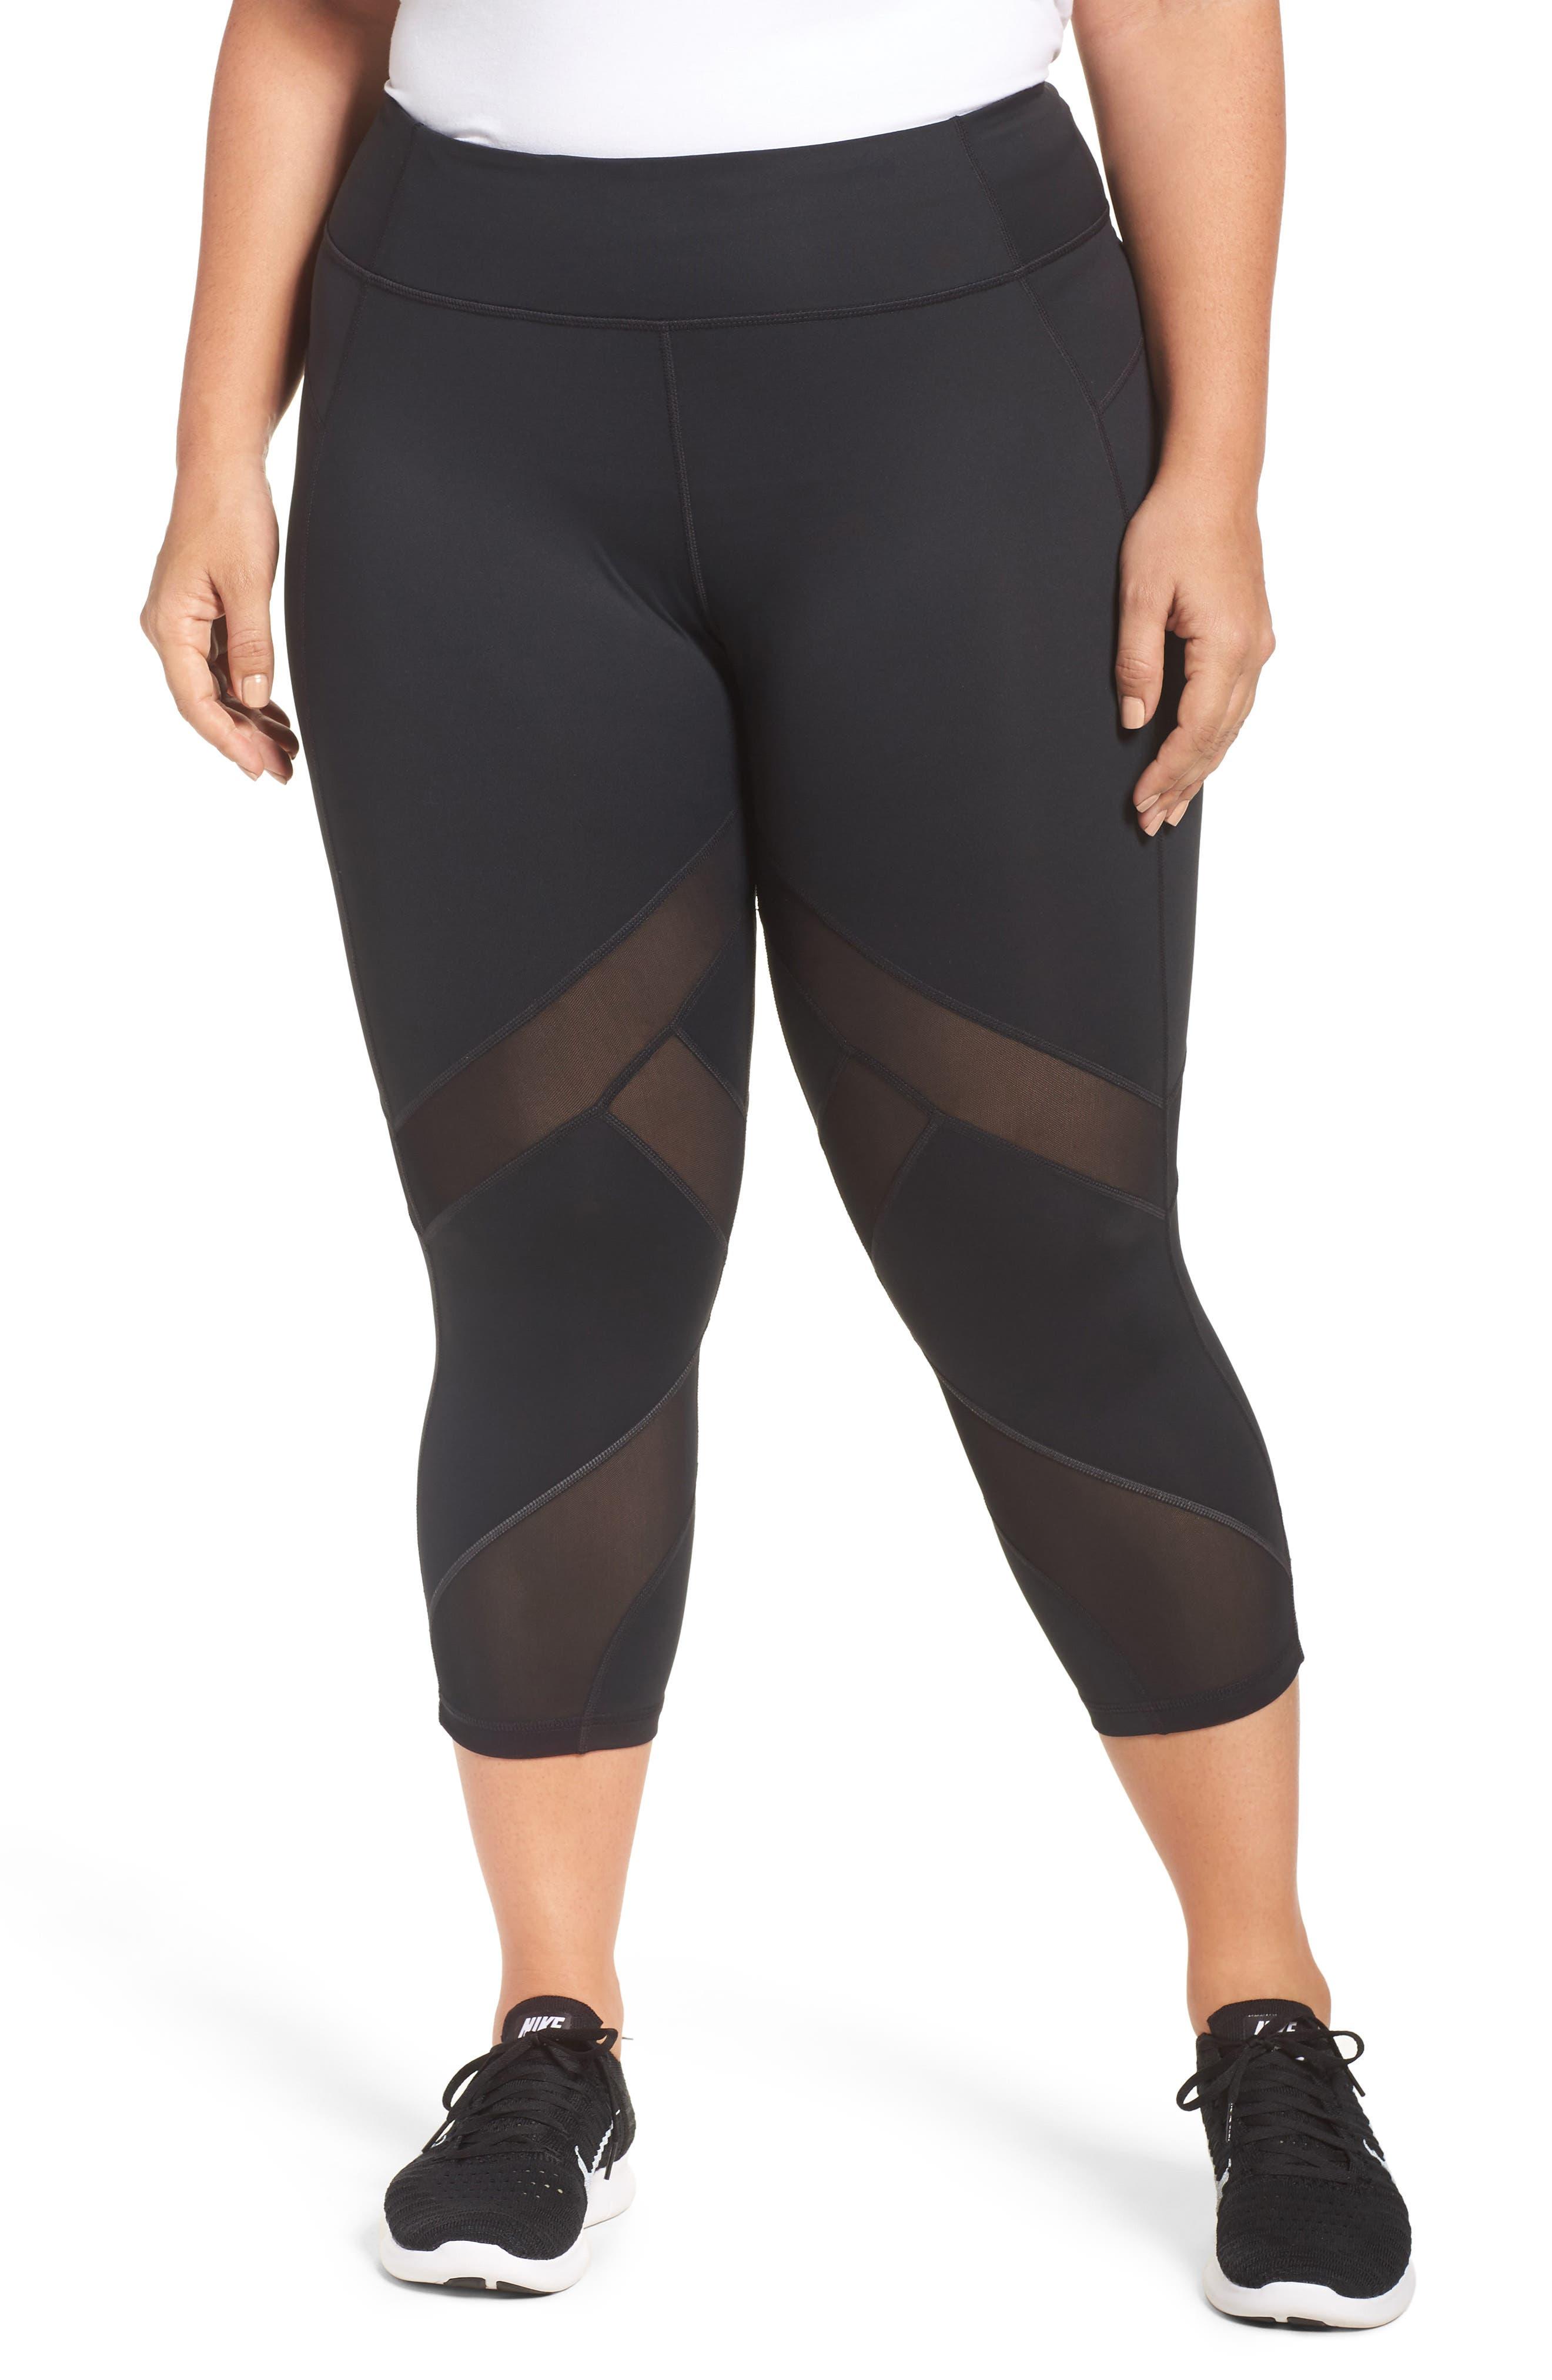 Sprint Crop Leggings,                         Main,                         color, Black